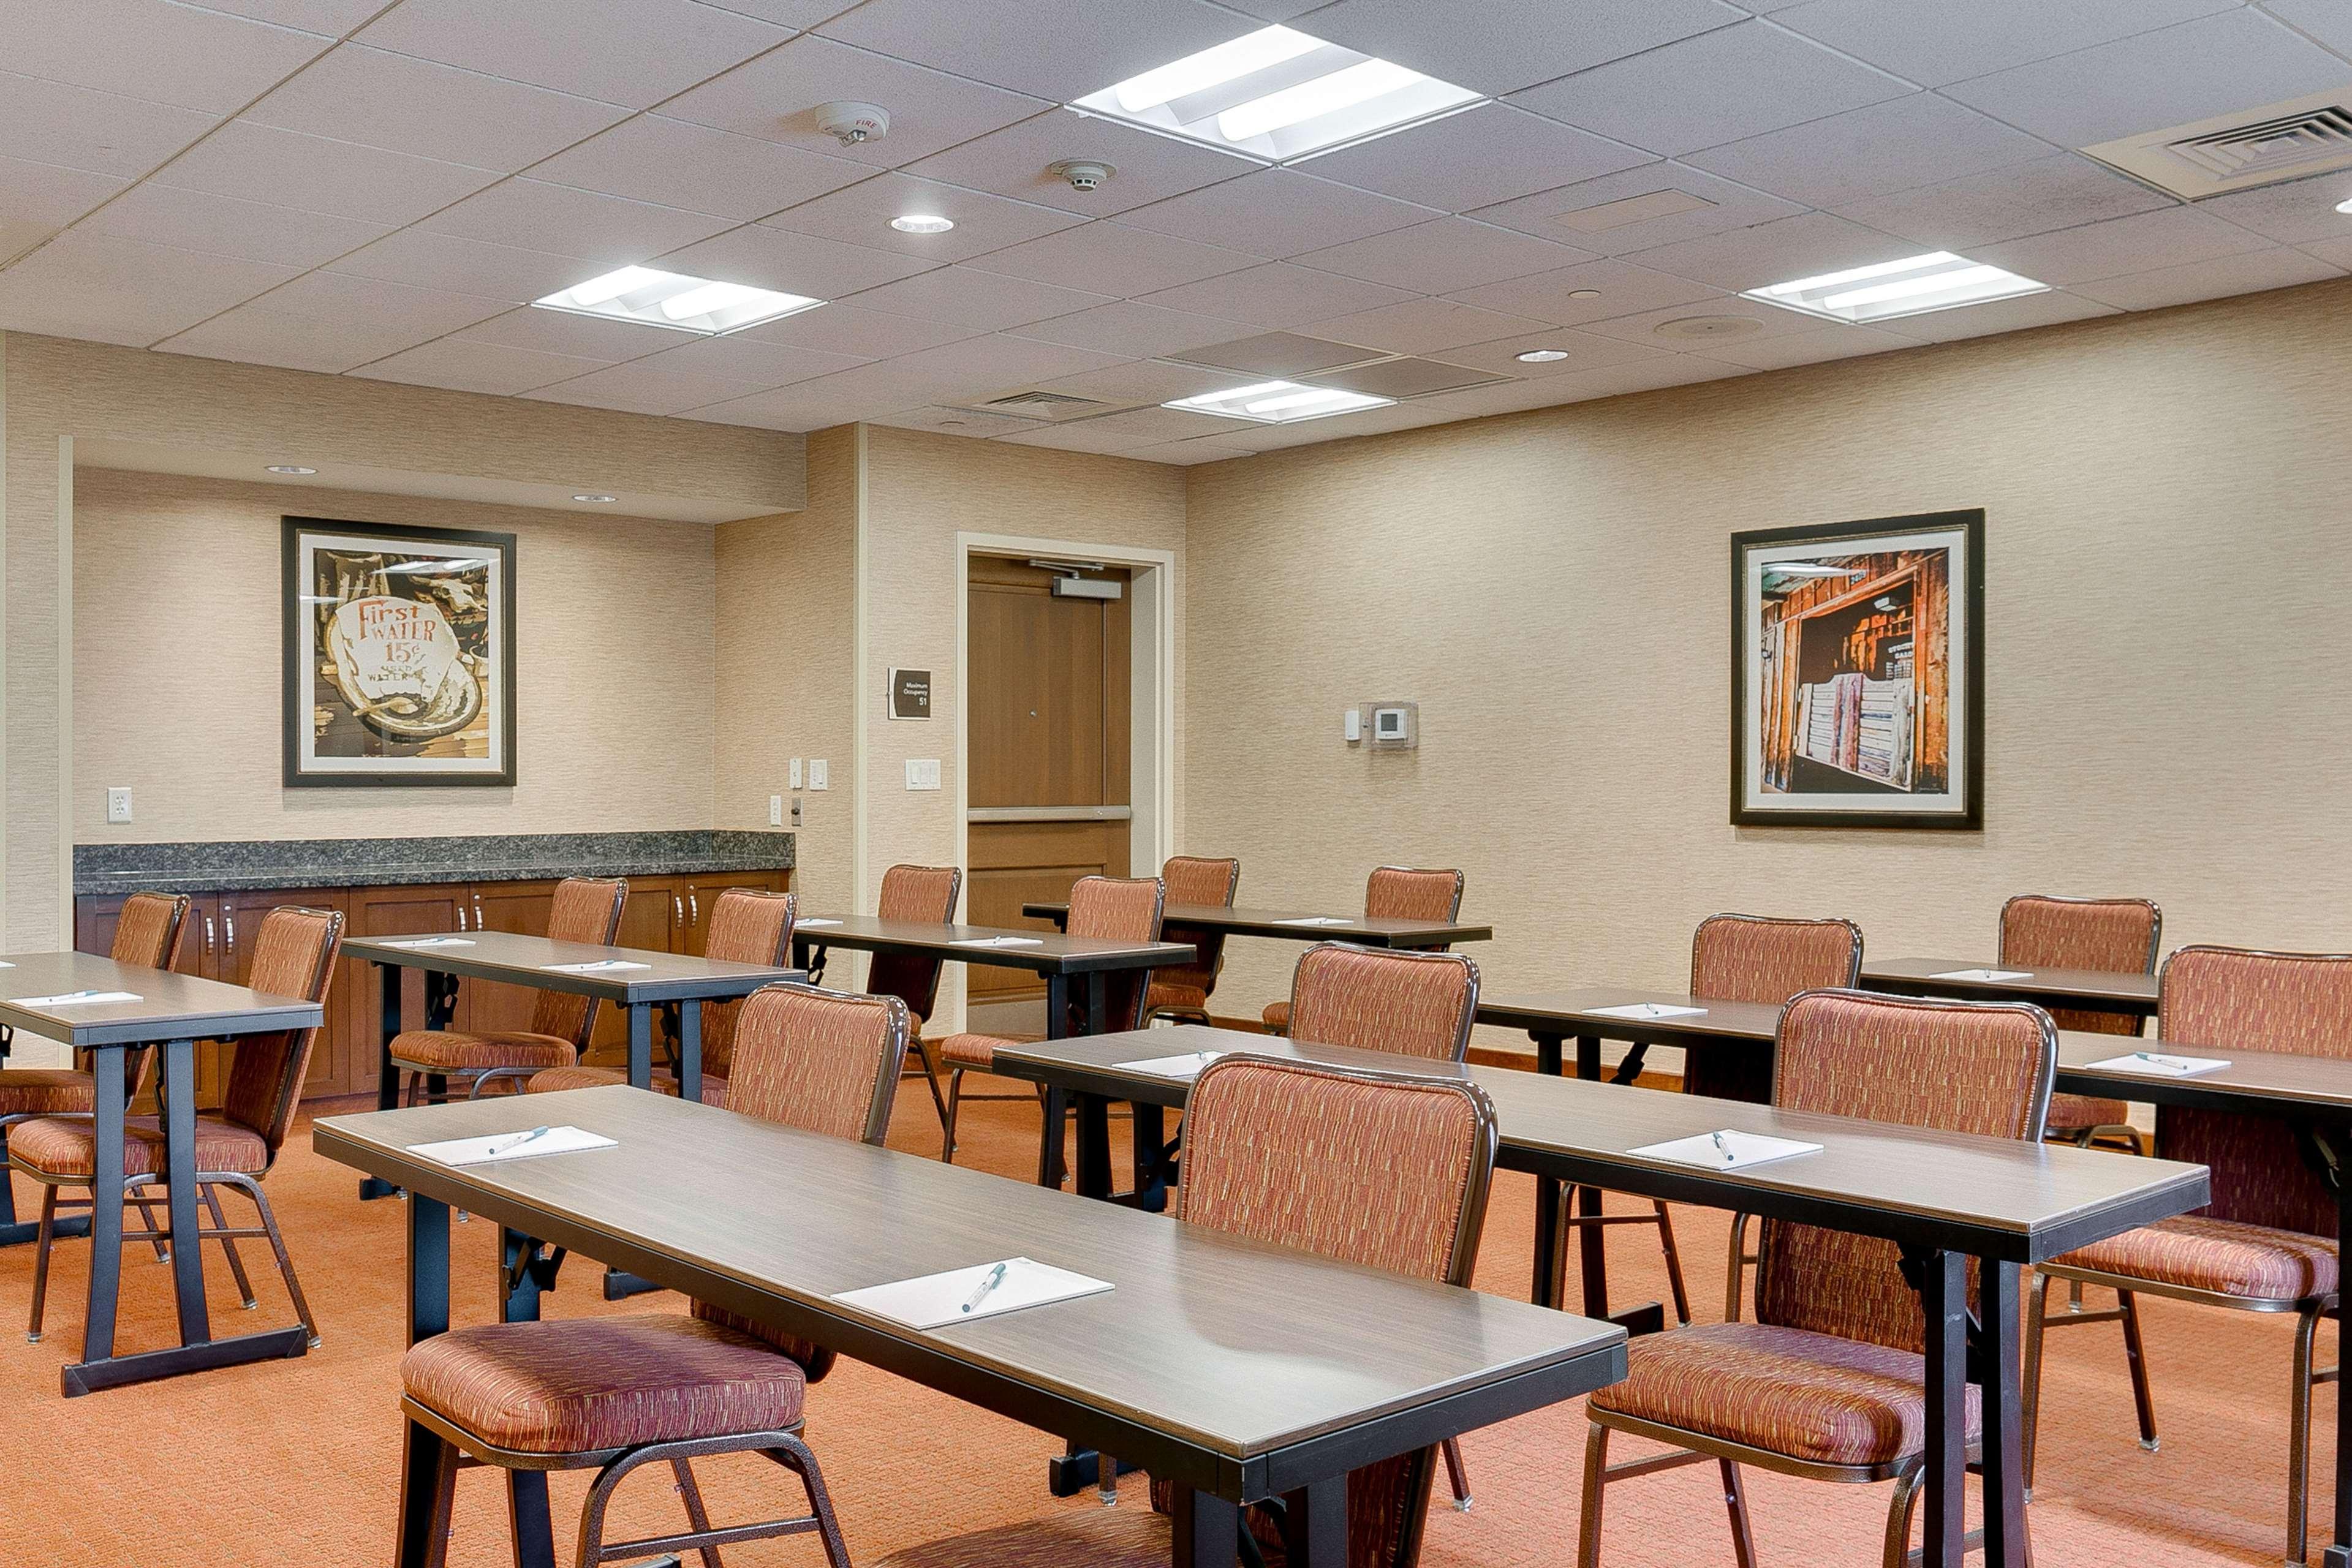 Homewood Suites by Hilton Fort Worth - Medical Center, TX image 25